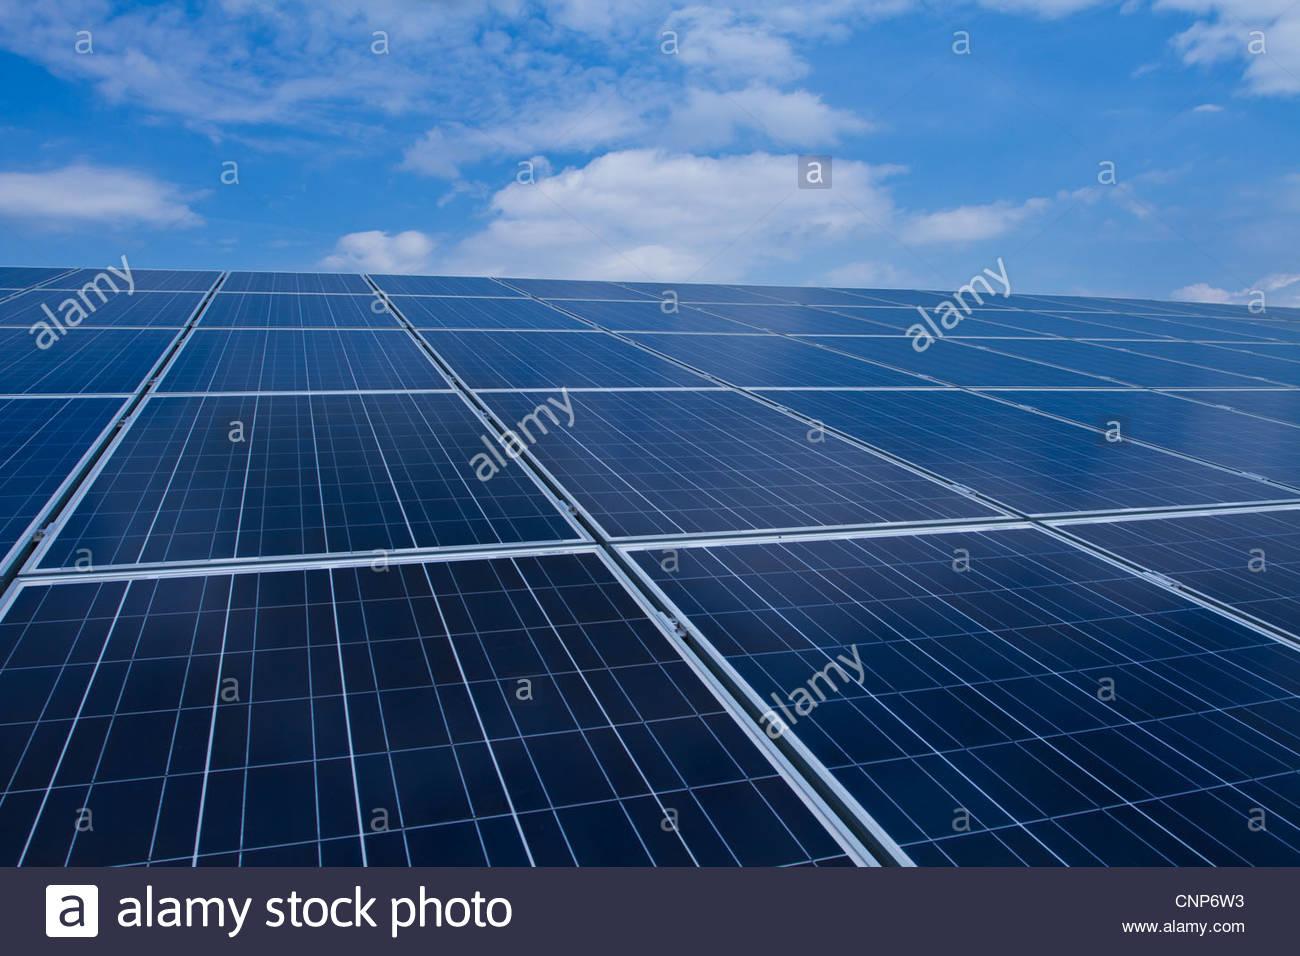 Solar panels under blue sky - Stock Image